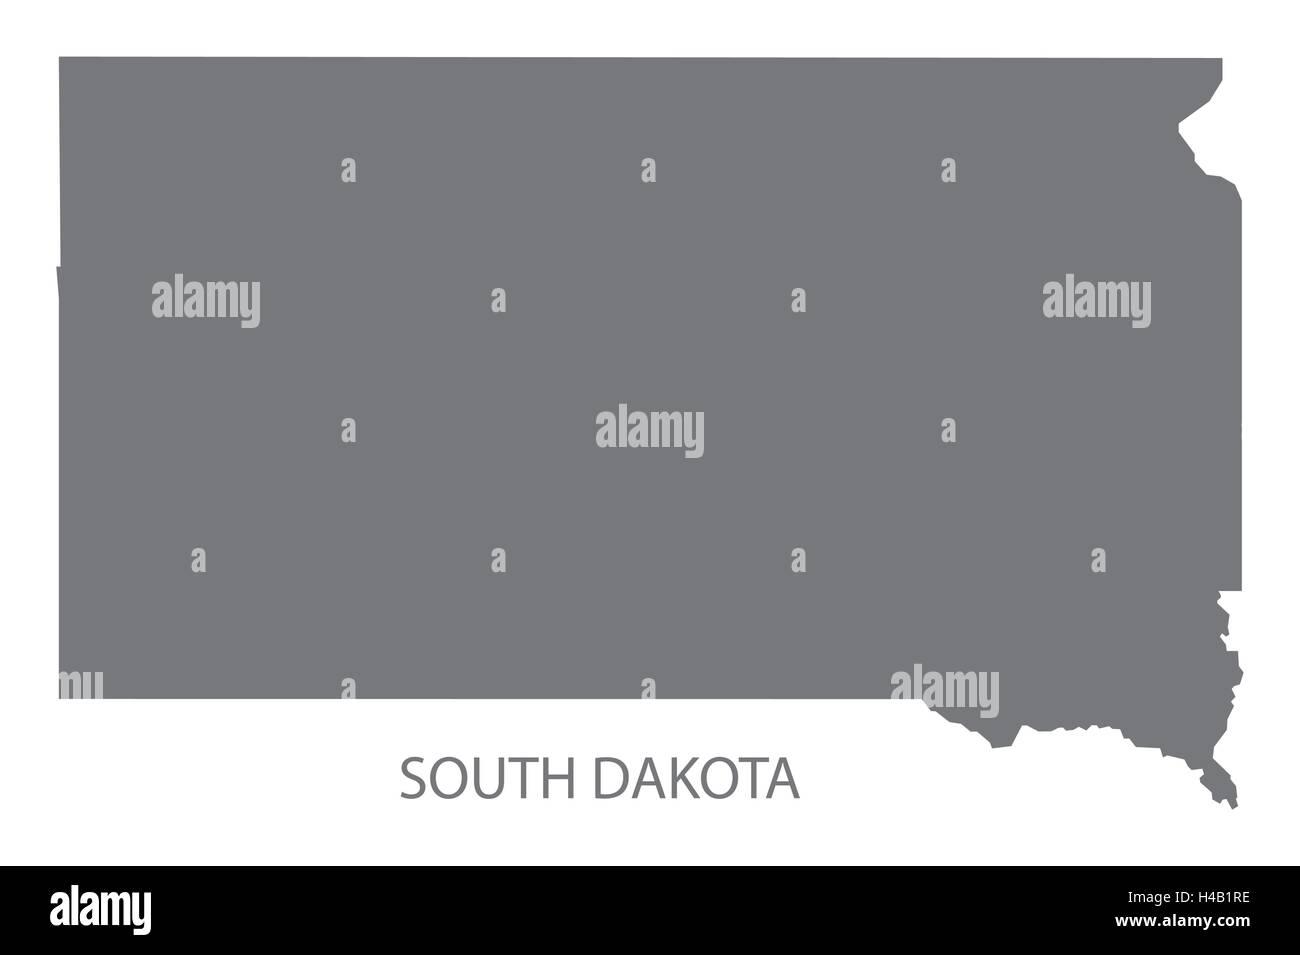 South Dakota USA Map In Grey Stock Vector Art Illustration - South dakota in usa map